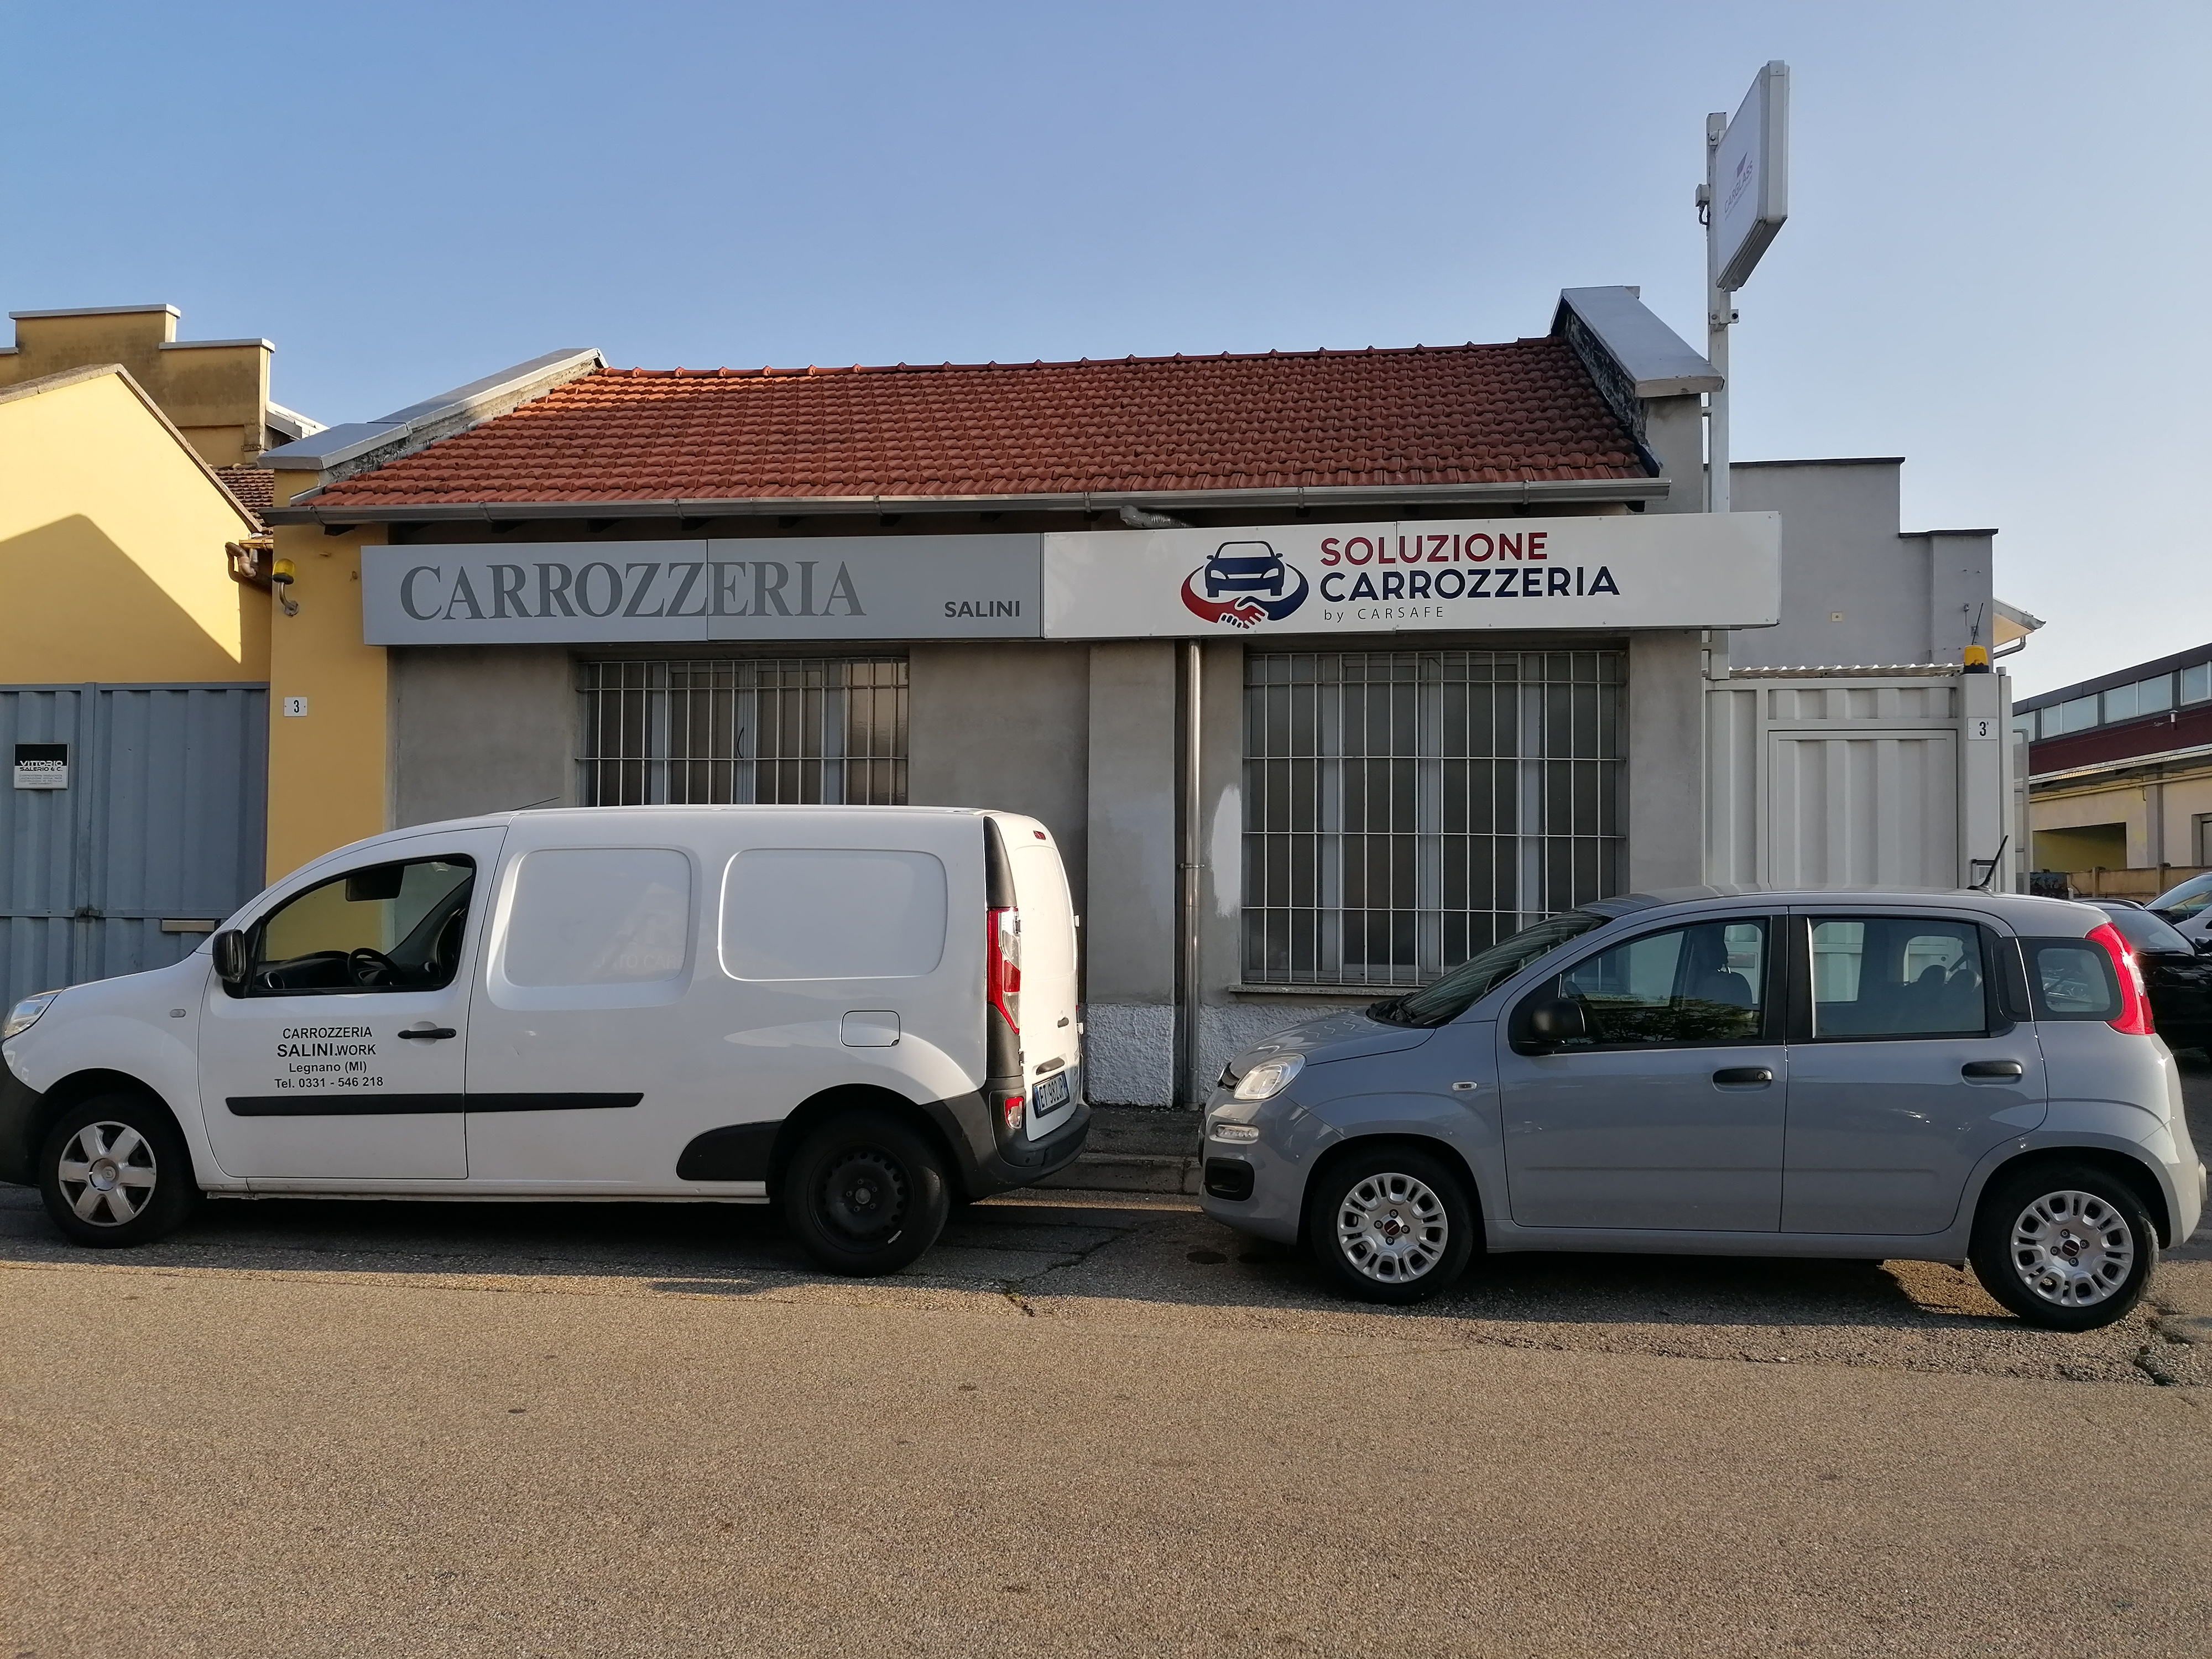 CARROZZERIA SALINI